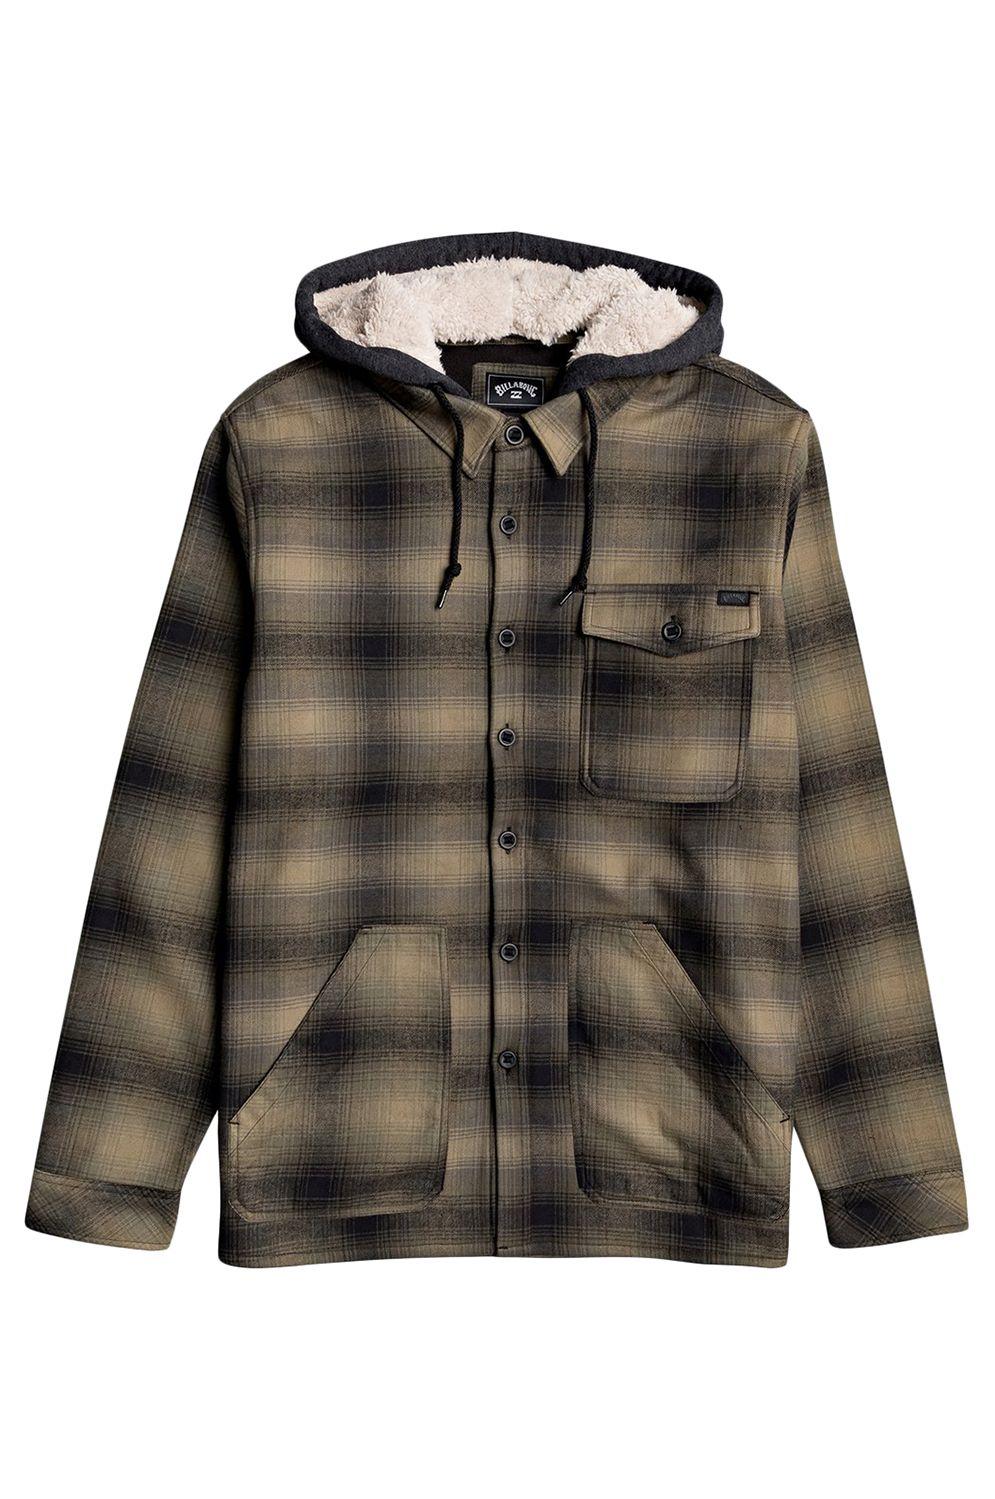 Camisa Billabong FURNACE BONDED ADVENTURE DIVISION Military